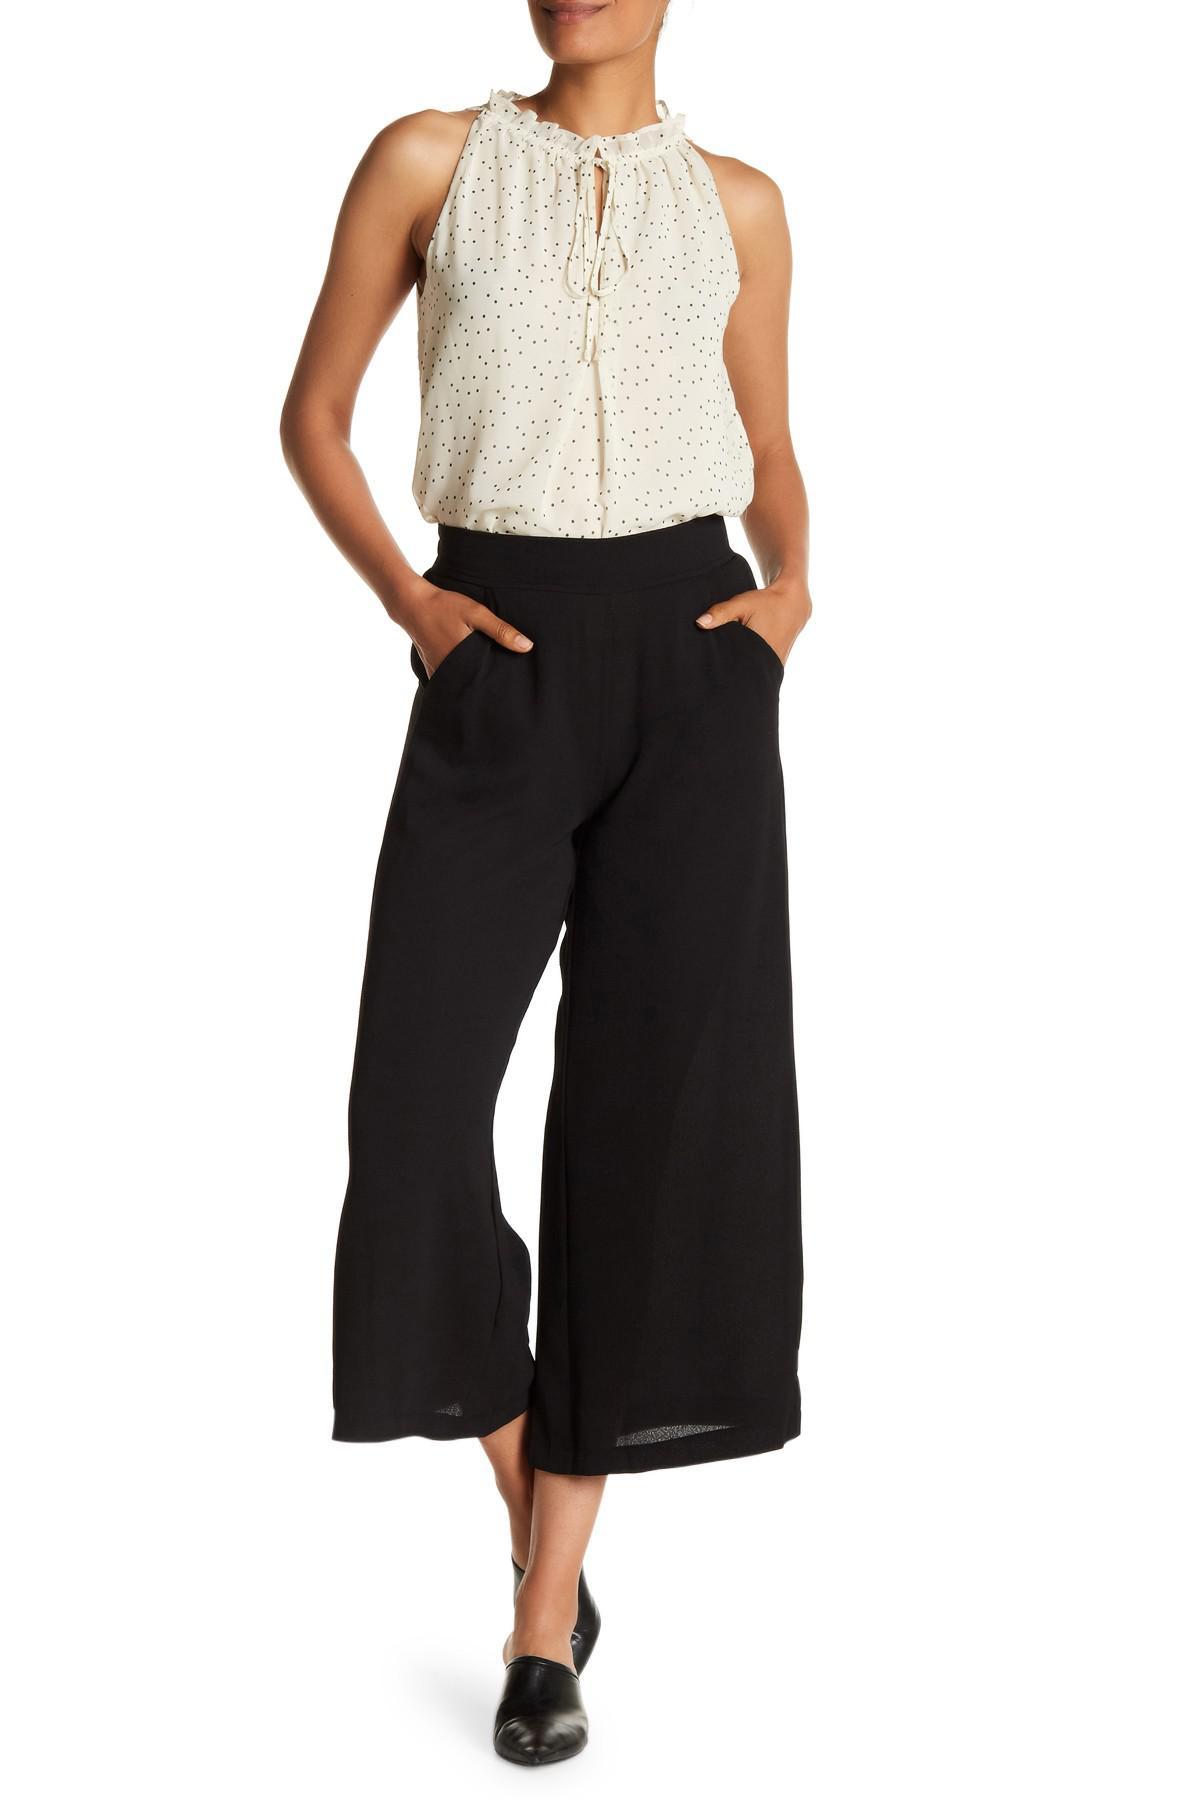 19f8fa9bad84f Lyst - Max Studio High Rise Crepe Culotte Pants in Black